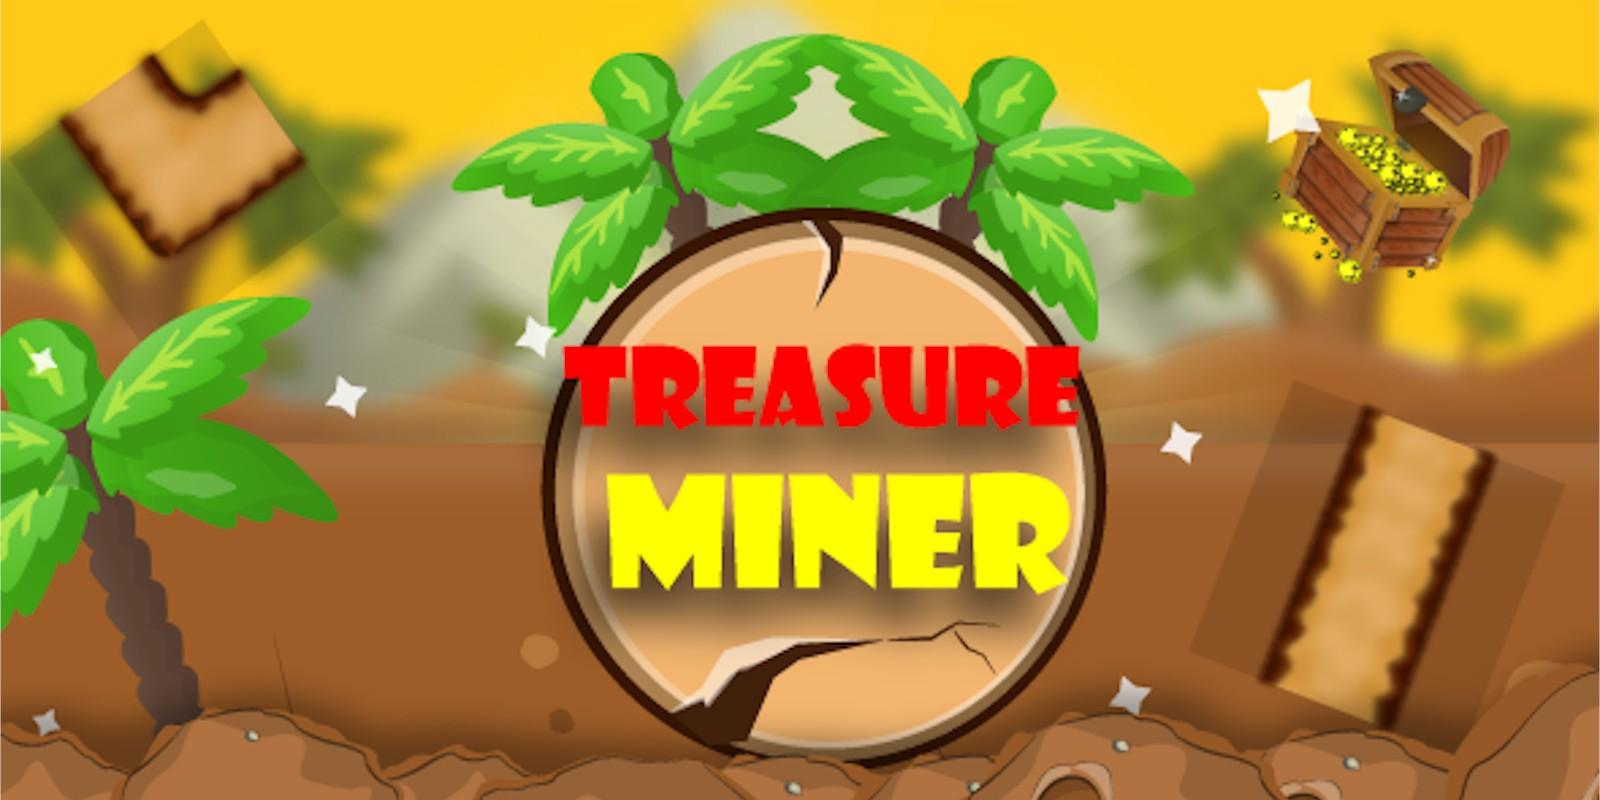 Treasure Miner - Unity Complete Project